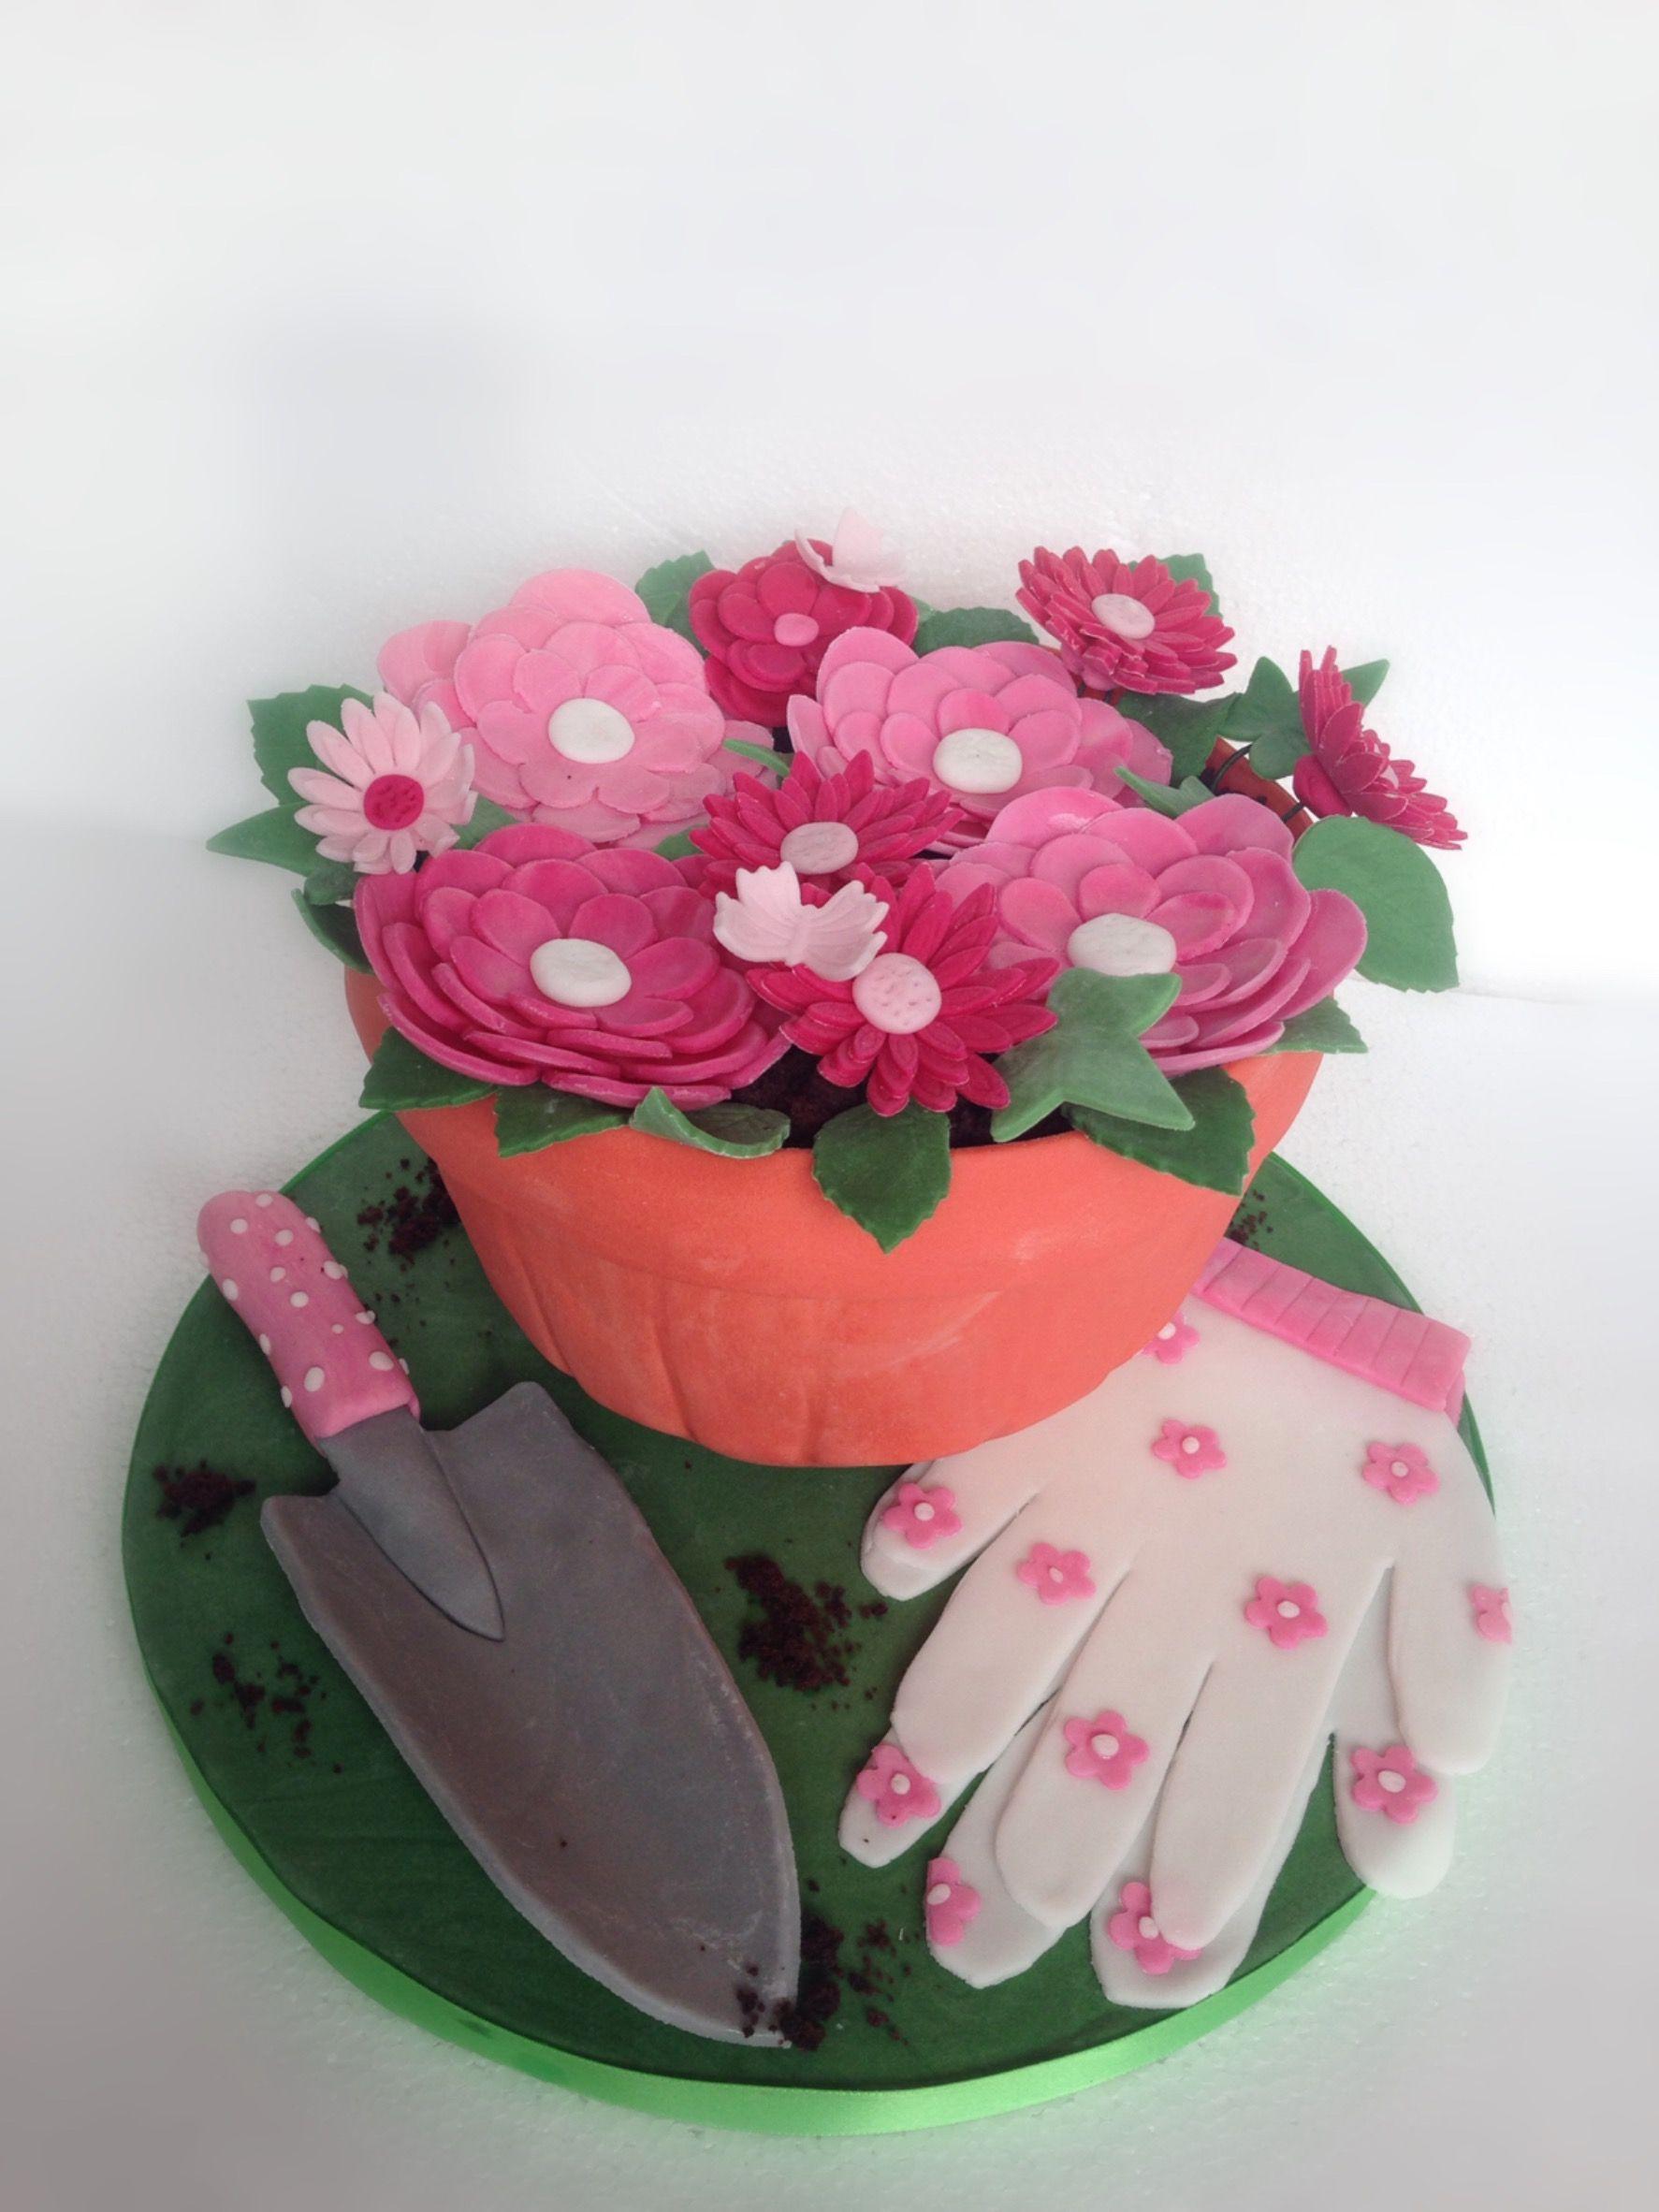 blumentopf torte 3d kuchen garten beet erde g rtner torte handschuh und. Black Bedroom Furniture Sets. Home Design Ideas